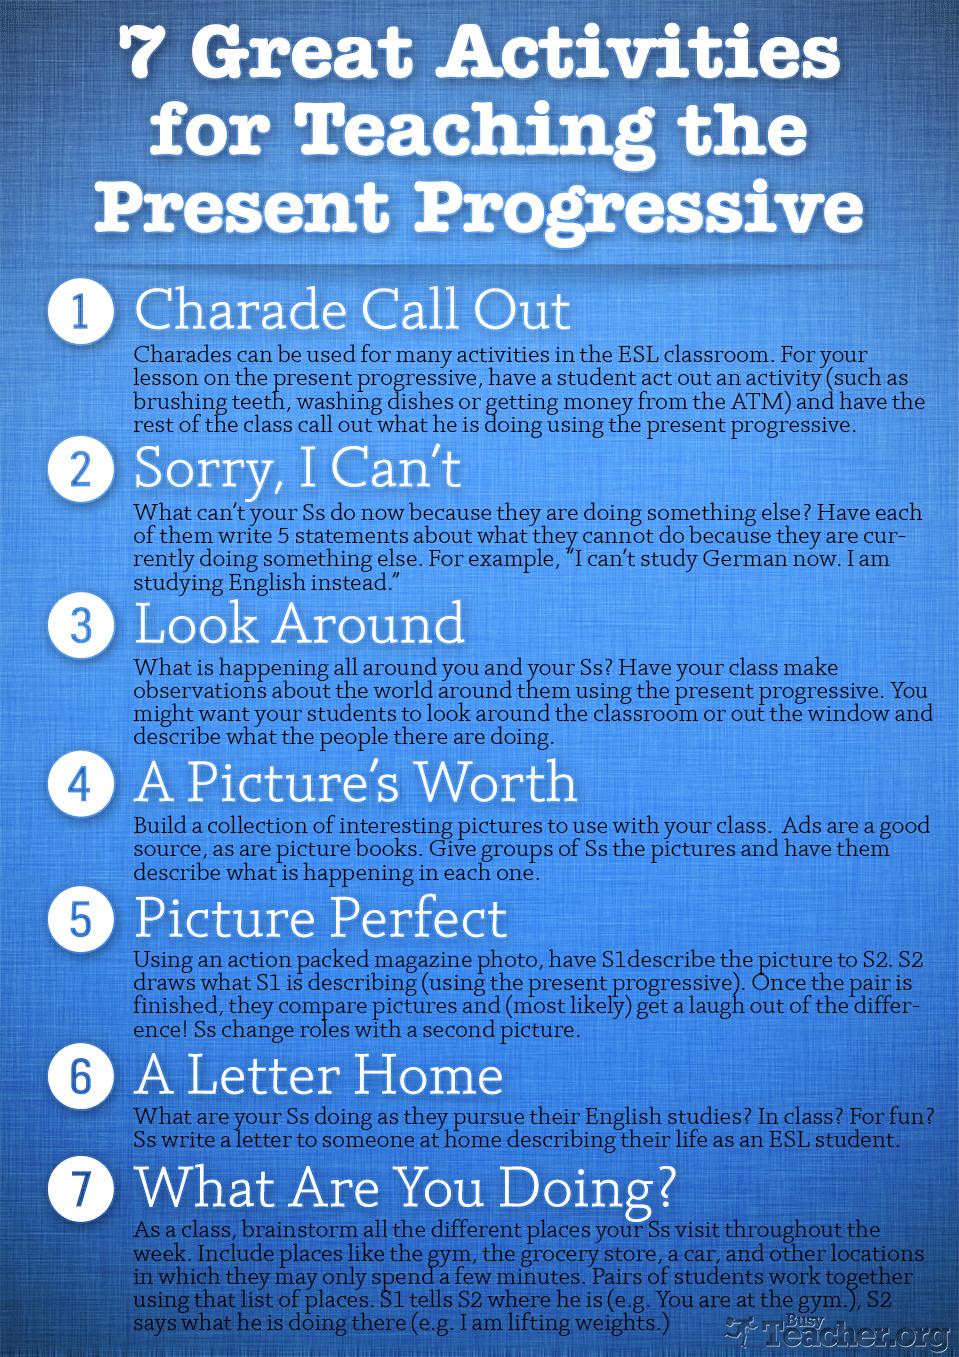 7 Great Activities to Teach the Present Progressive: Poster